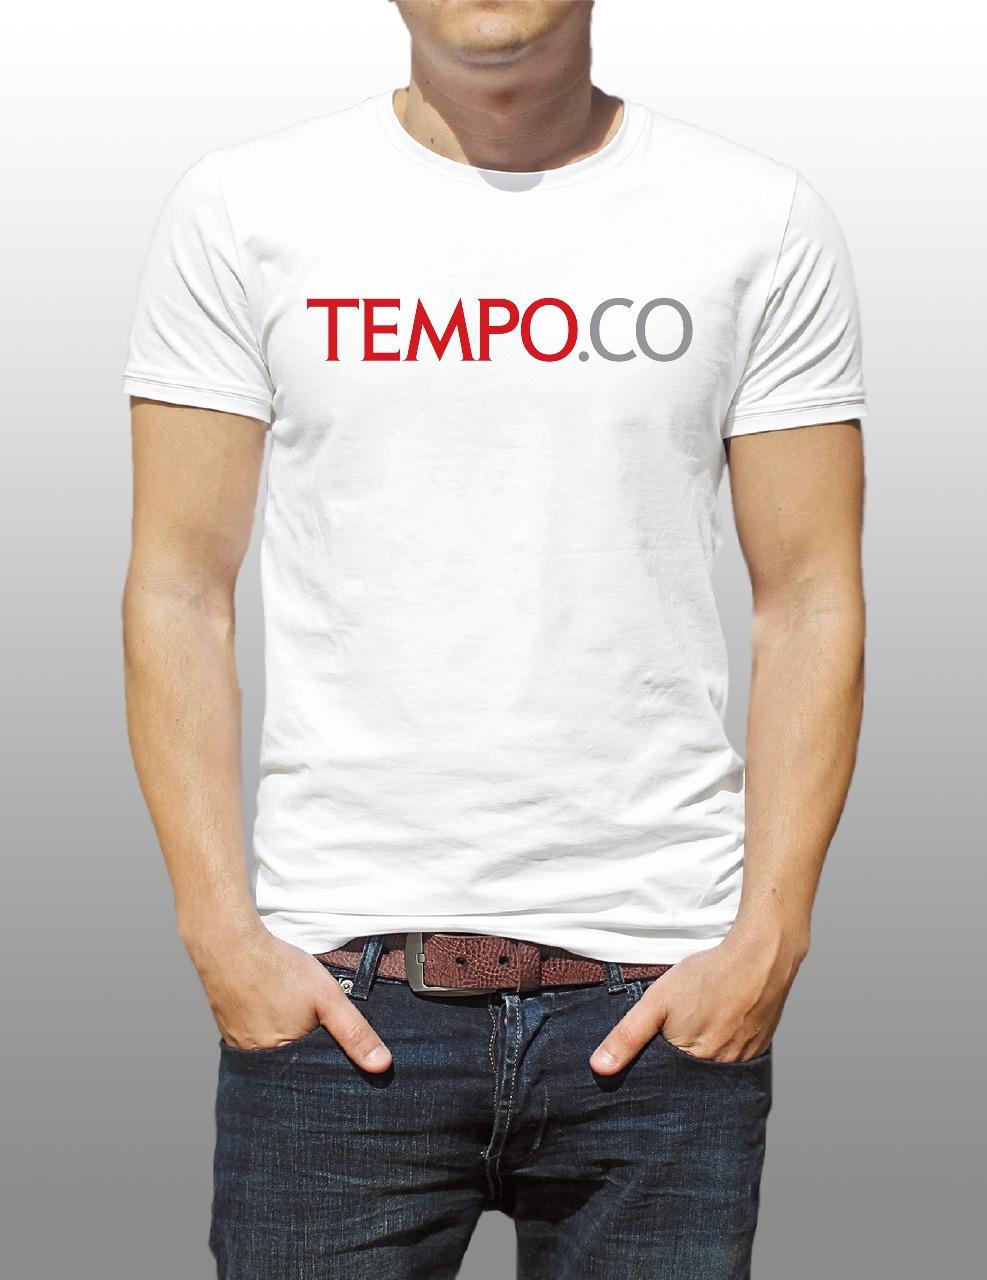 T Shirt TEMPOCO - Official Merchandise TEMPO